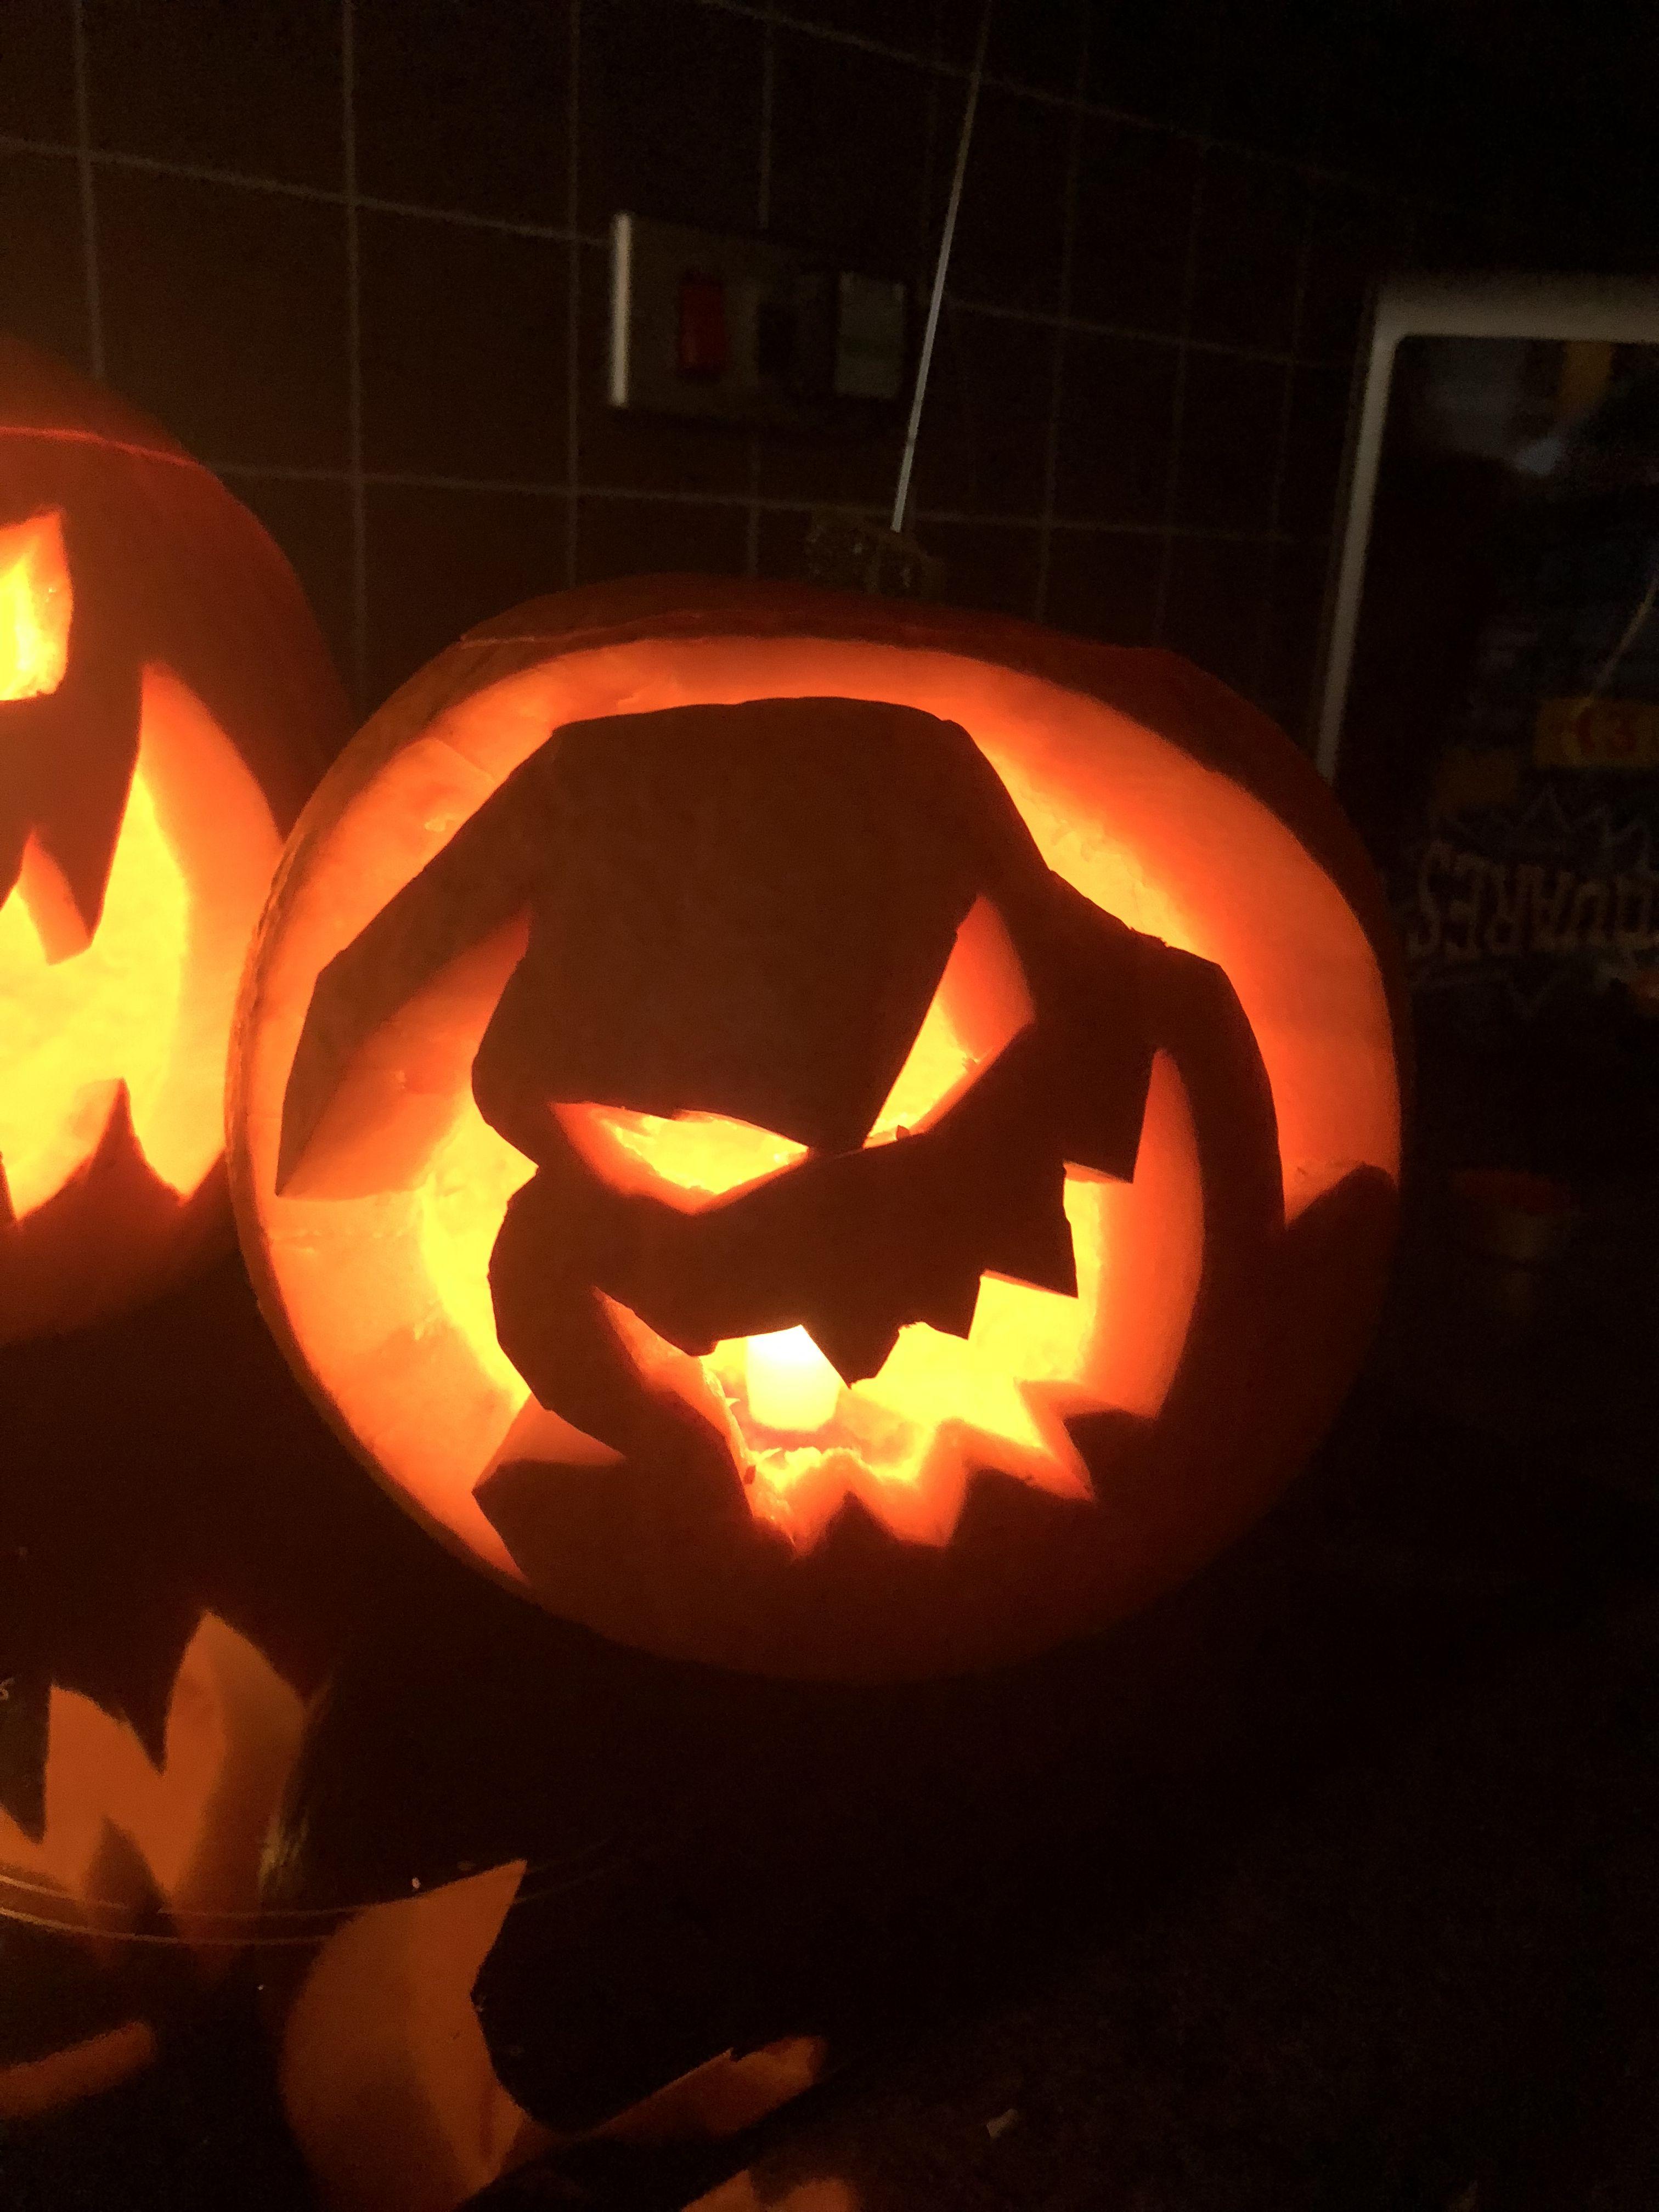 The nightmare before Christmas character pumpkins  JackSkellington   PumpkinKing  OogieBoogie de9564f68e4e